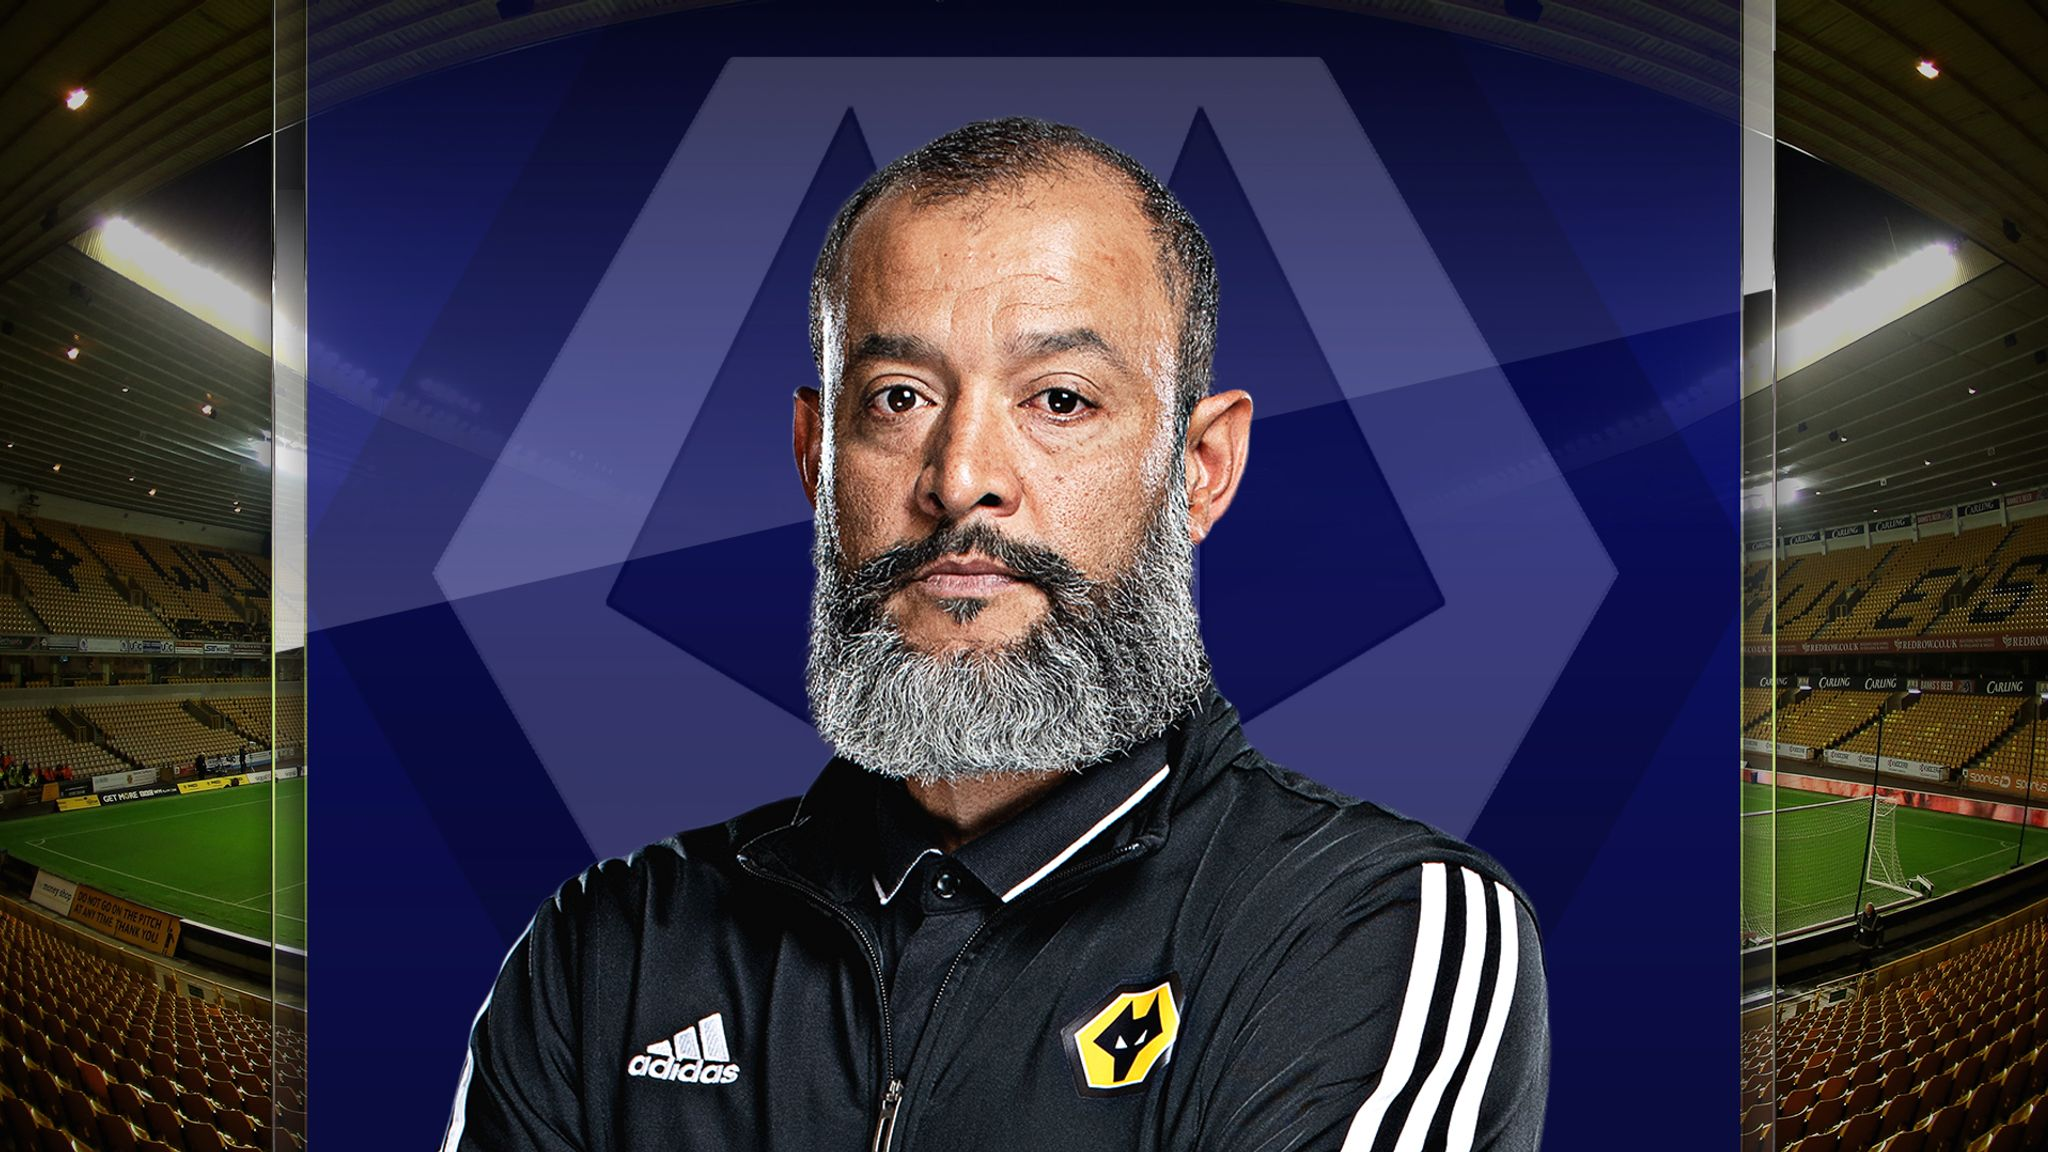 Nuno Espirito Santo S Success At Wolves And His Future Beyond Football News Sky Sports